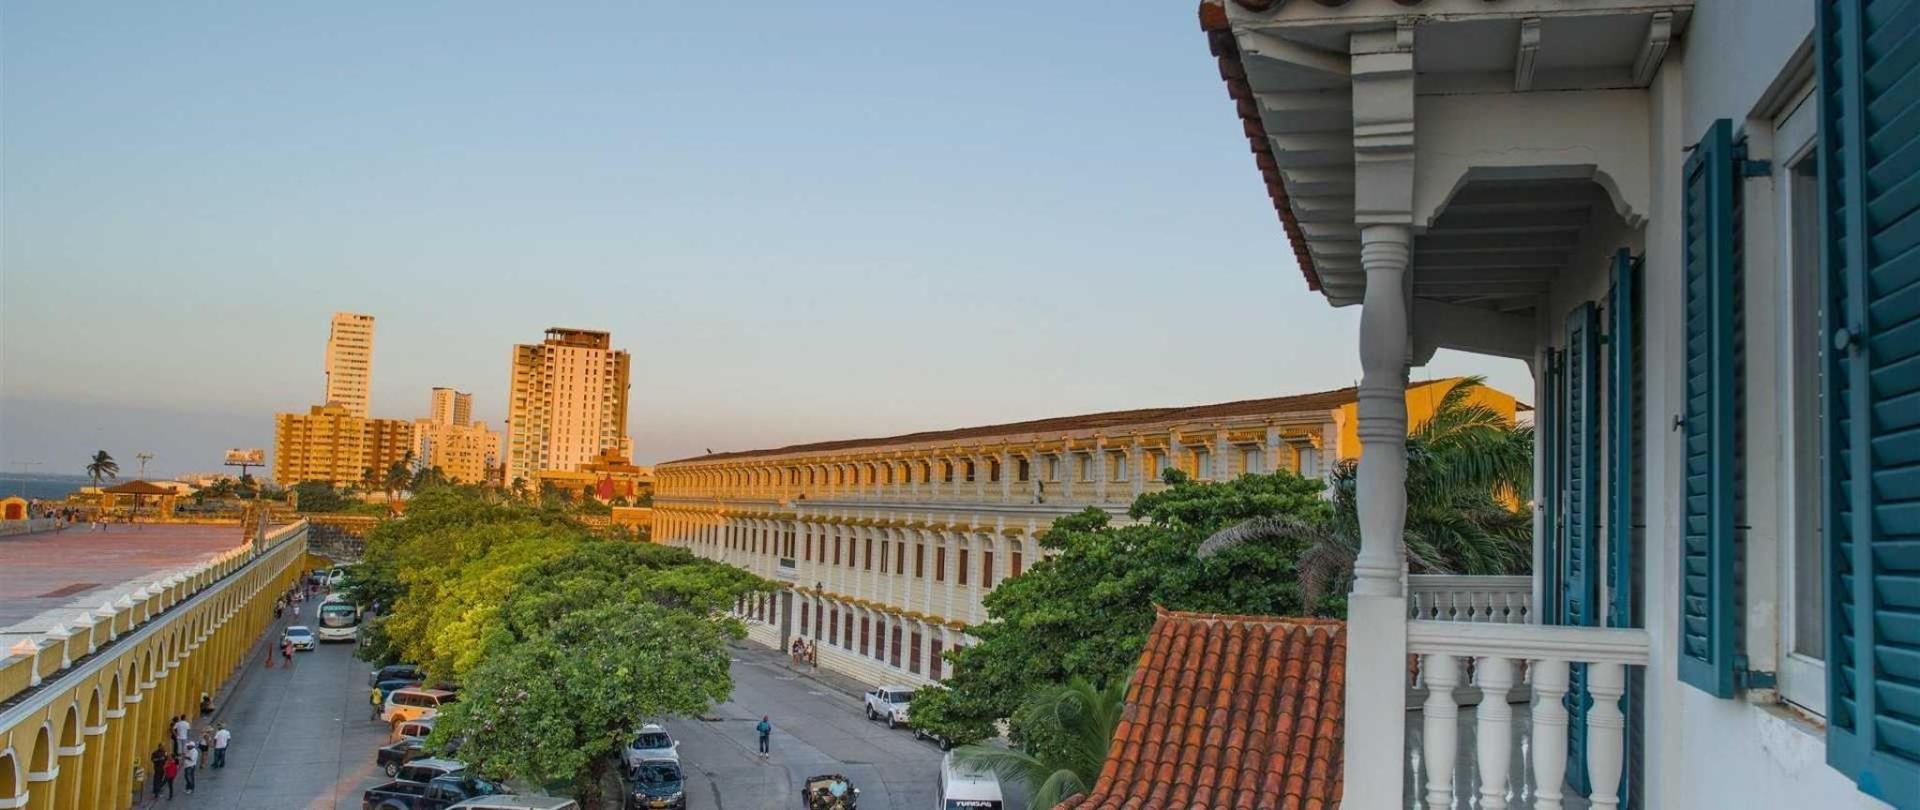 Bóvedas de Santa Clara Balcony.jpg